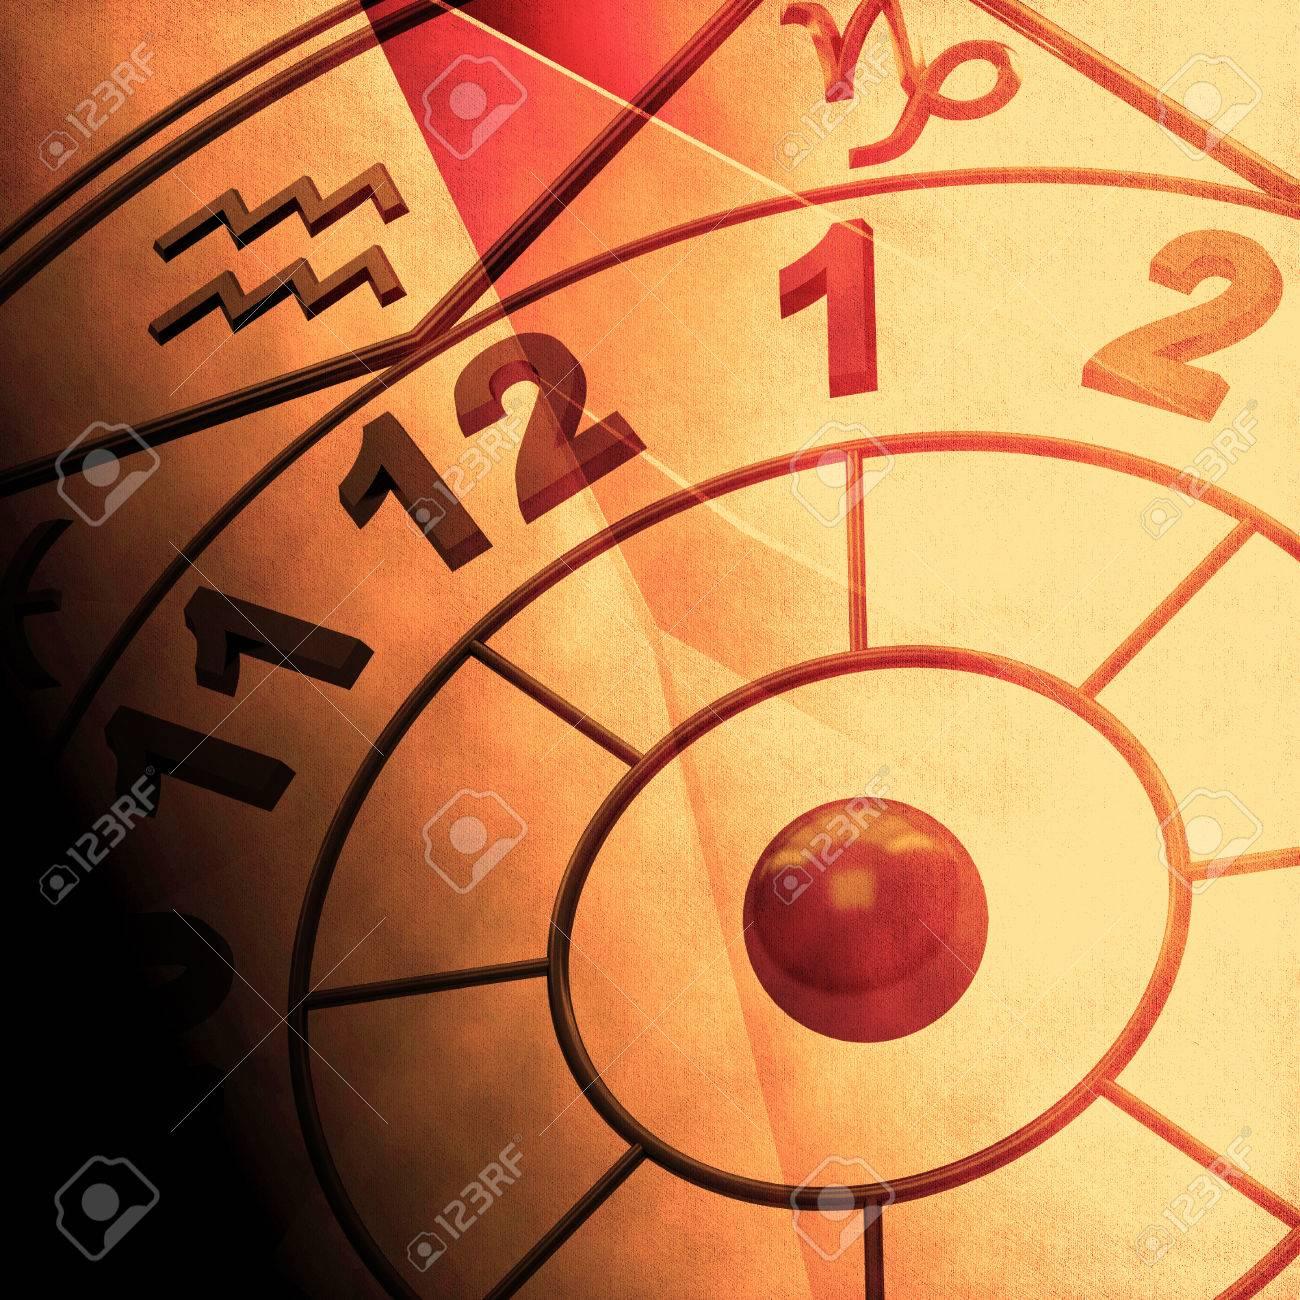 Zodiac Signs - New age horoscope